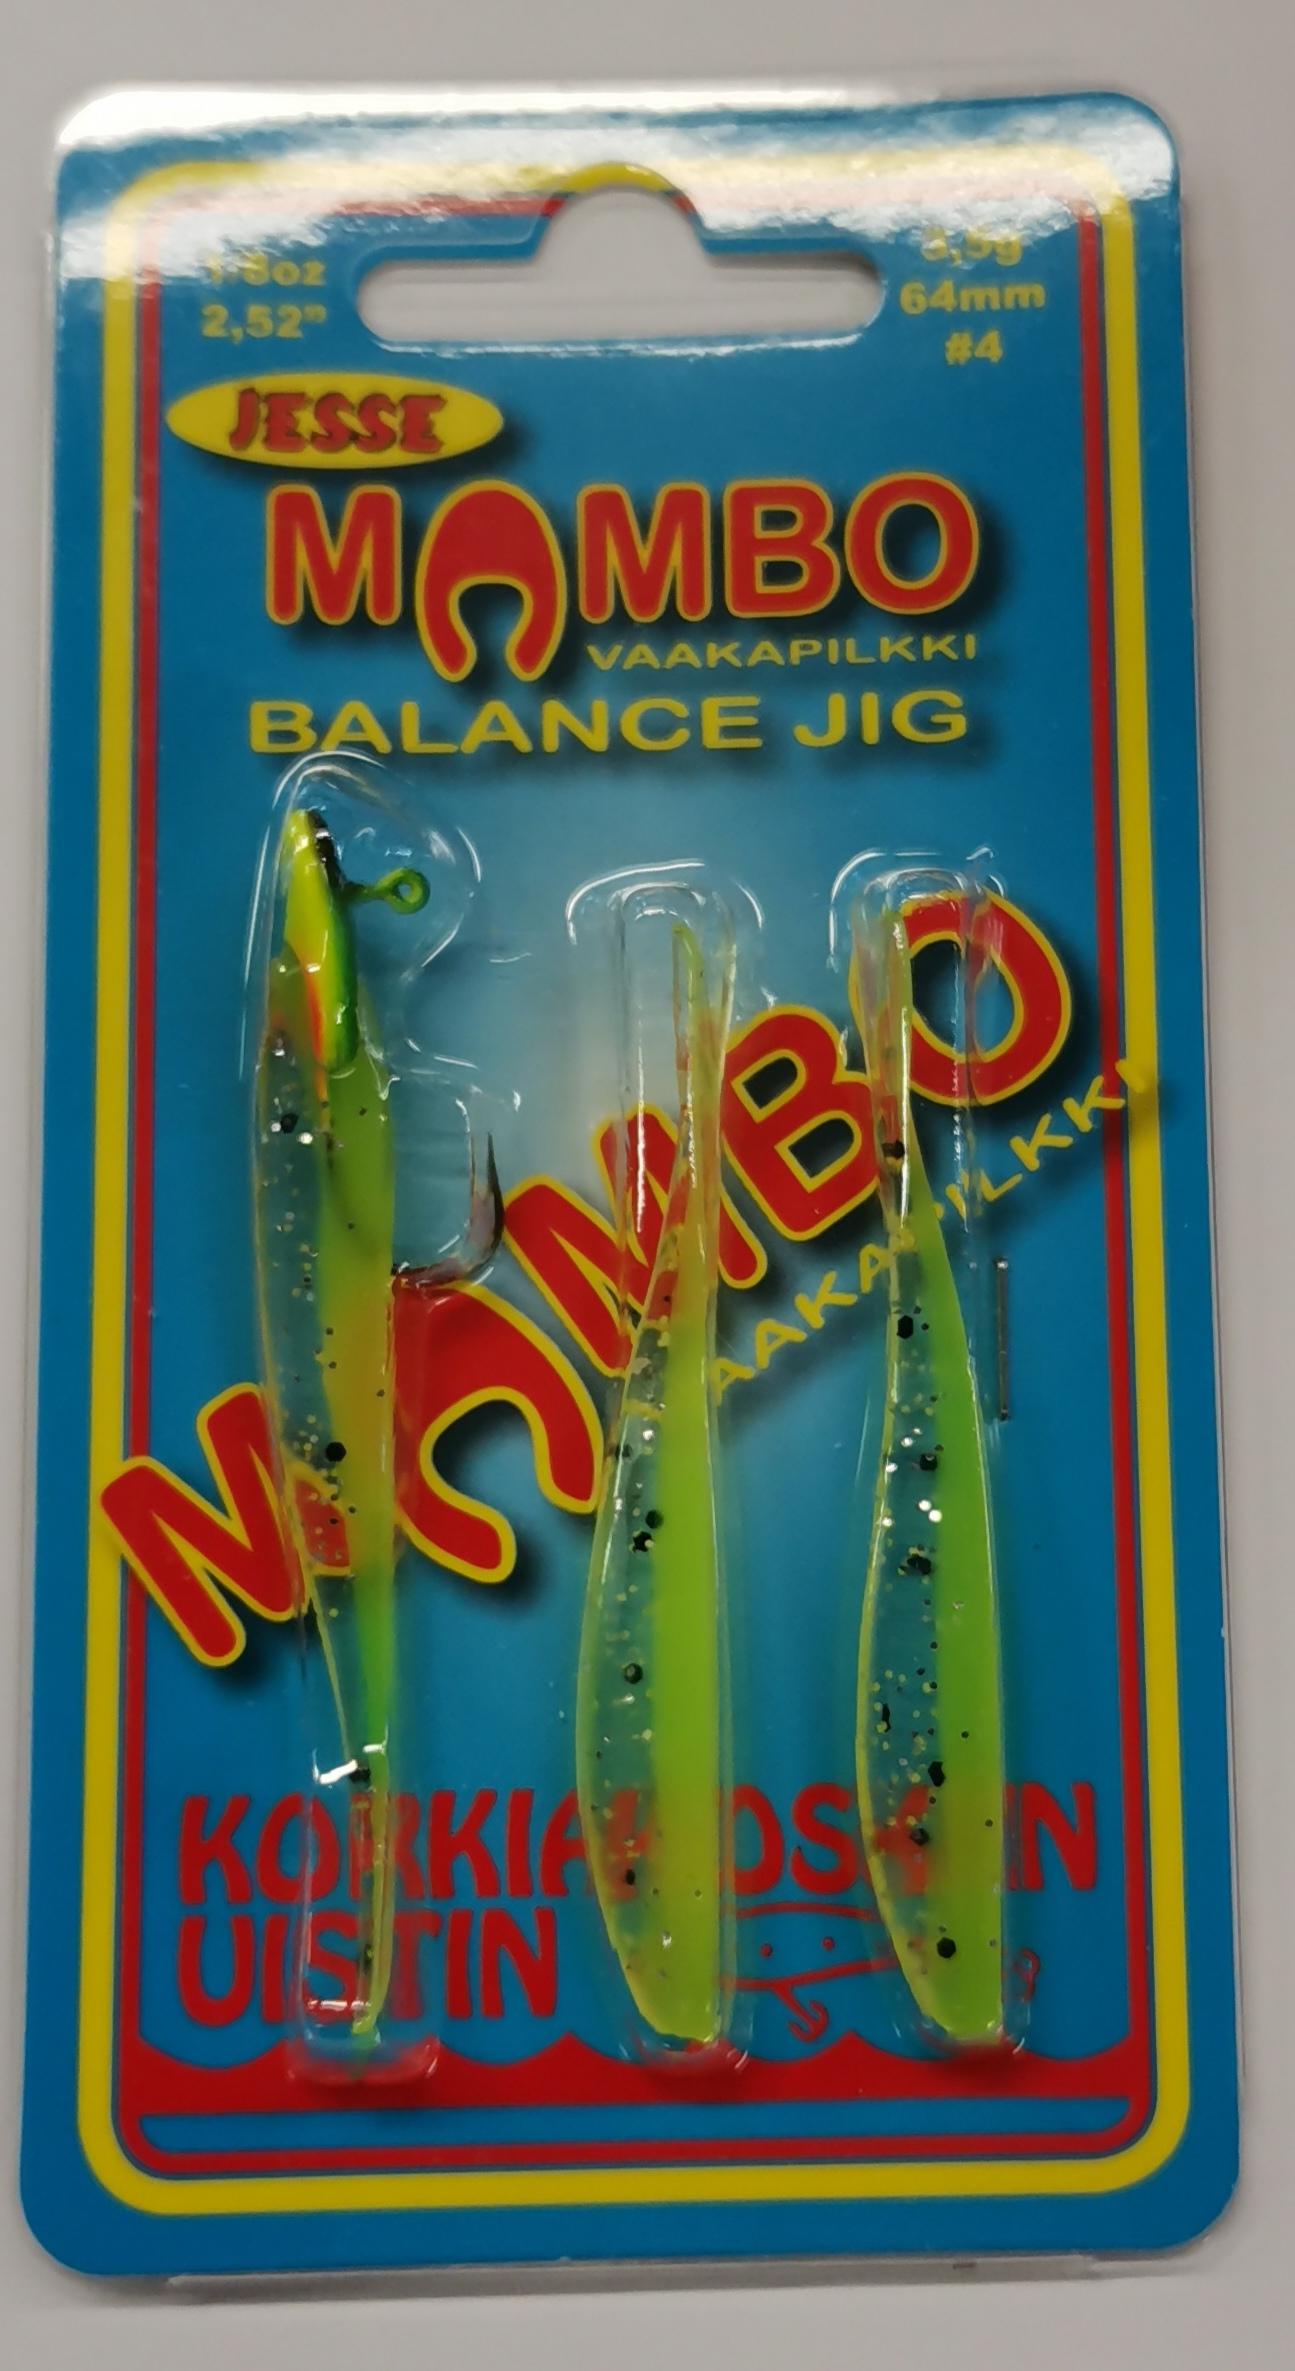 Mambo vaakapilkki 64mm 3,5g väri 07